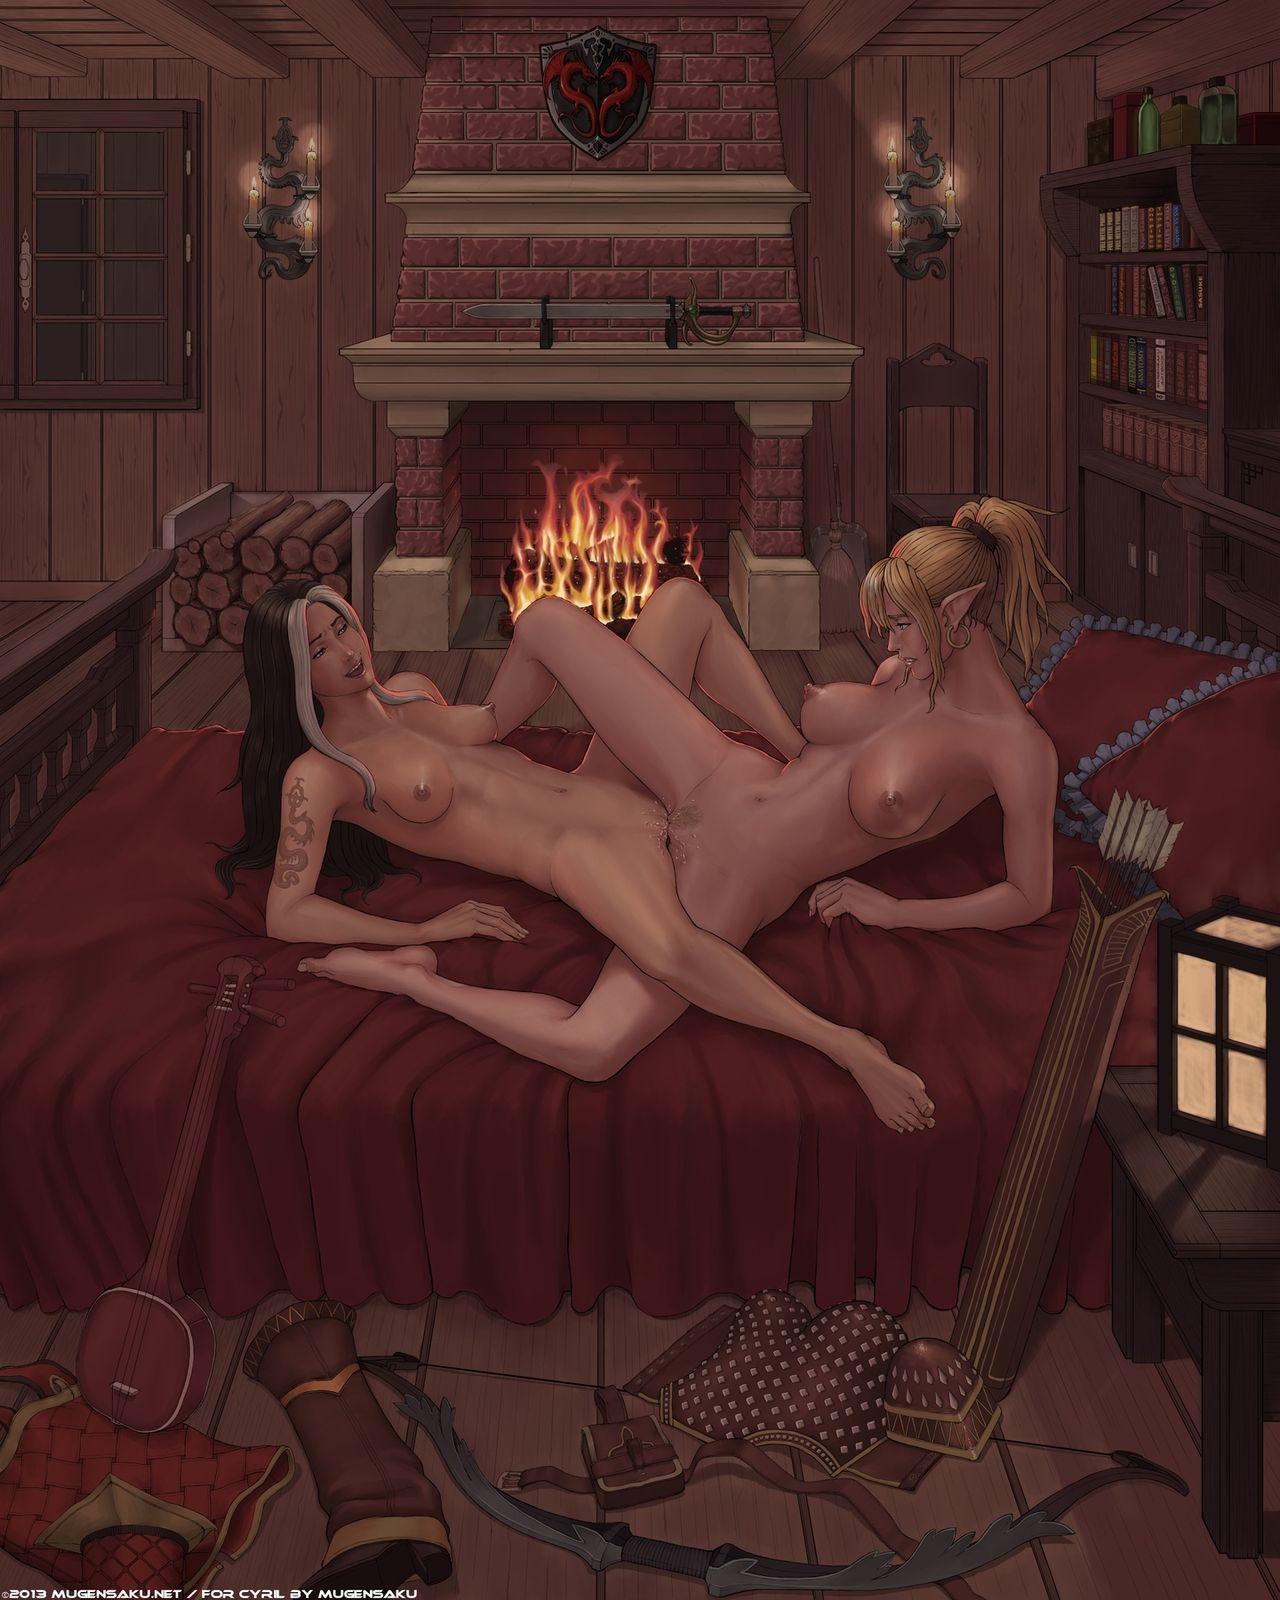 Artist - Mugensaku - part 3